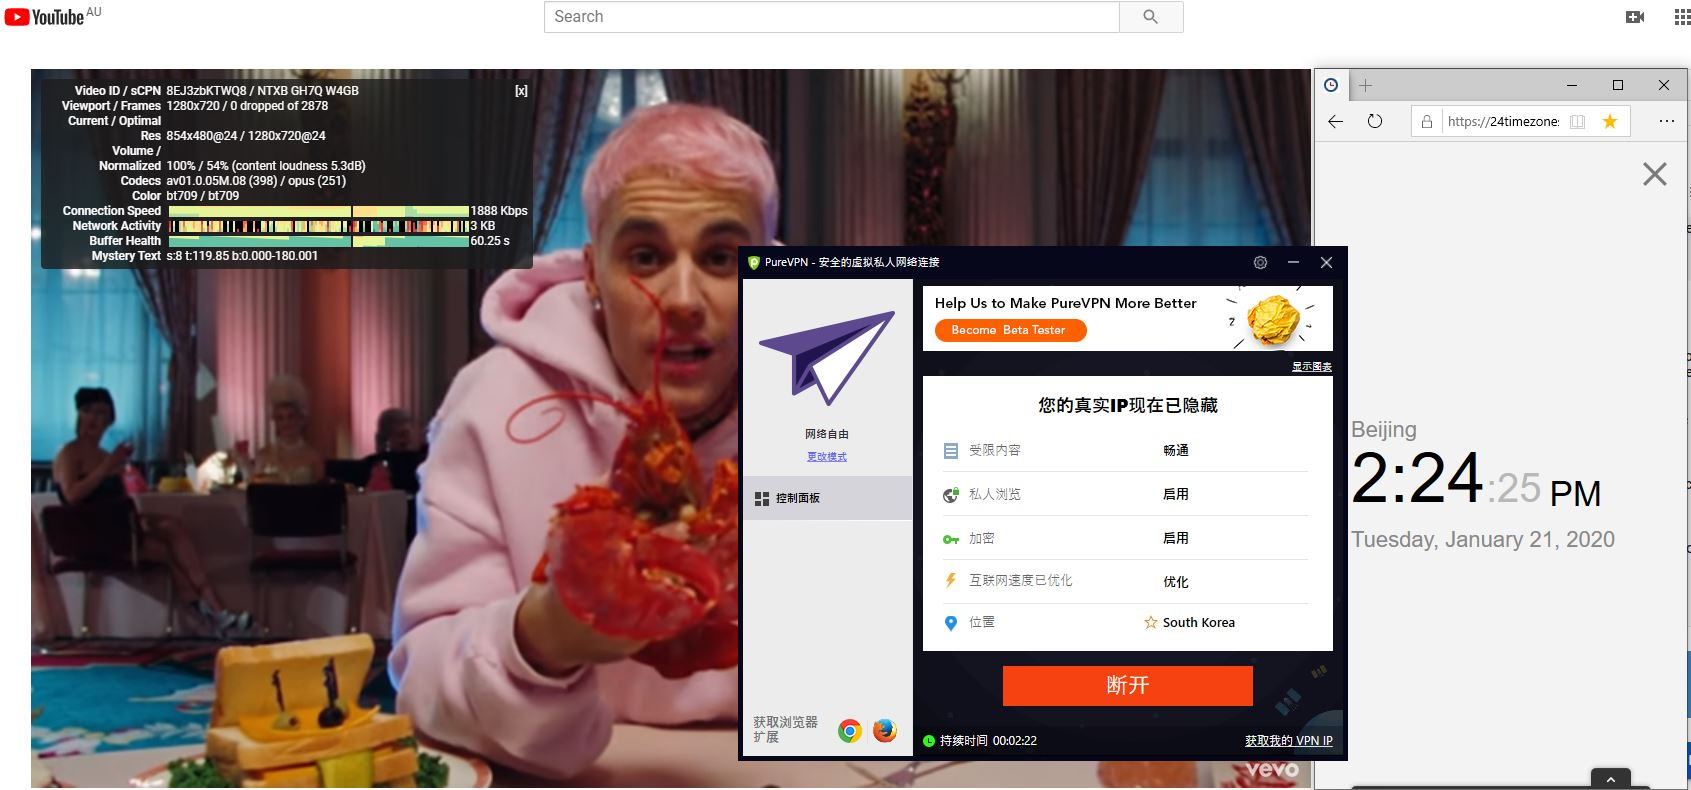 Windows10 PureVPN South Korea 中国VPN翻墙 科学上网 Youtube测速-20200121